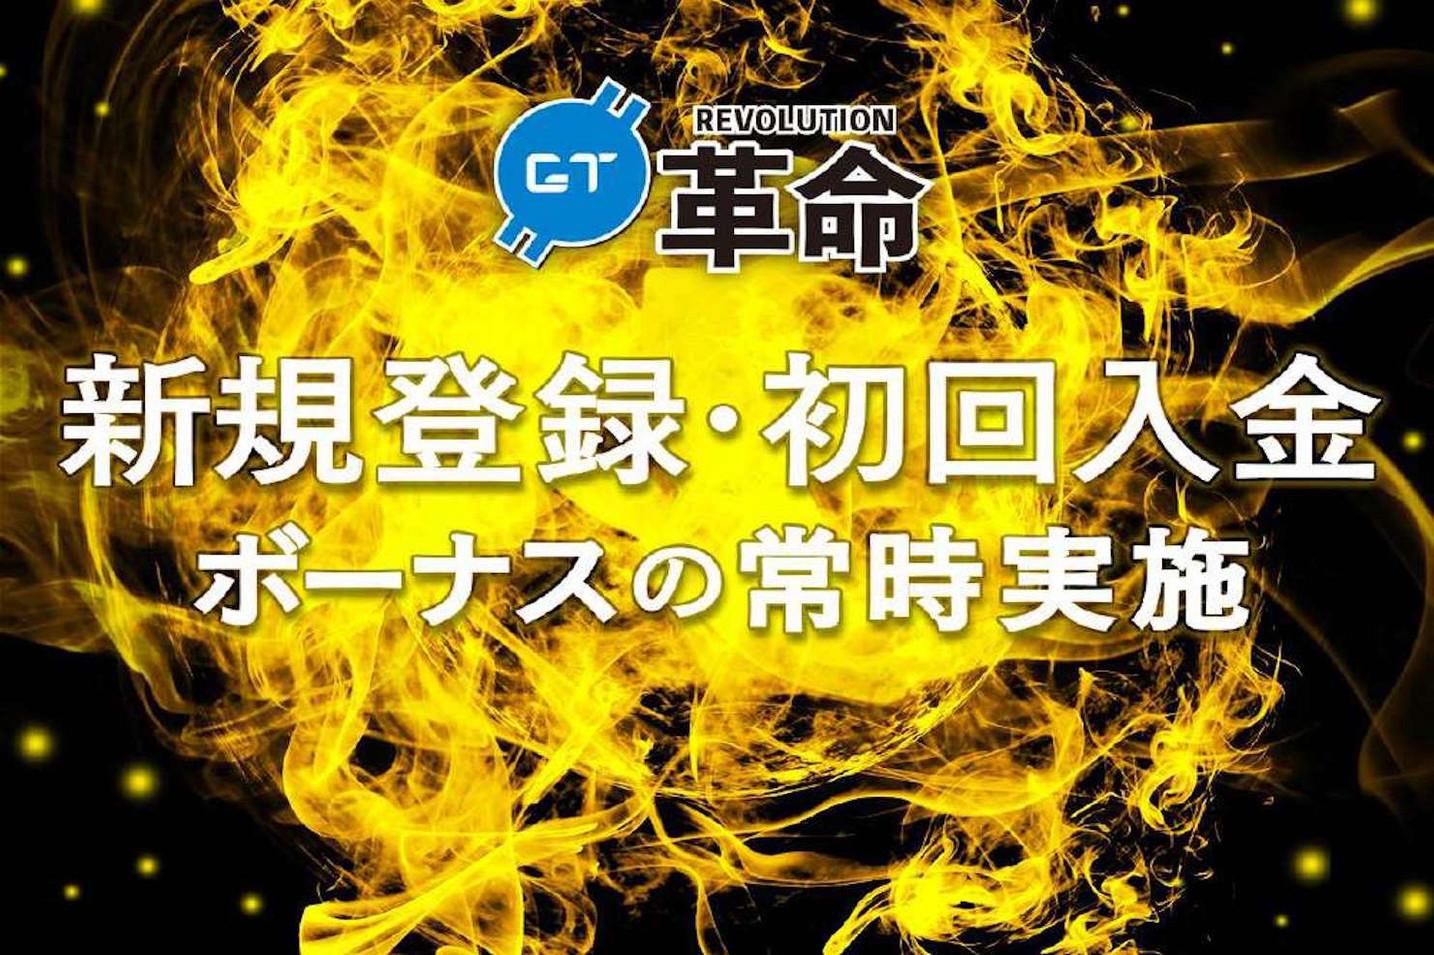 CryptoGT(クリプトGT),「GT 革命第二弾: ボーナス革命」として、新規登録ボーナスと初回入金ボーナ スの常時実施